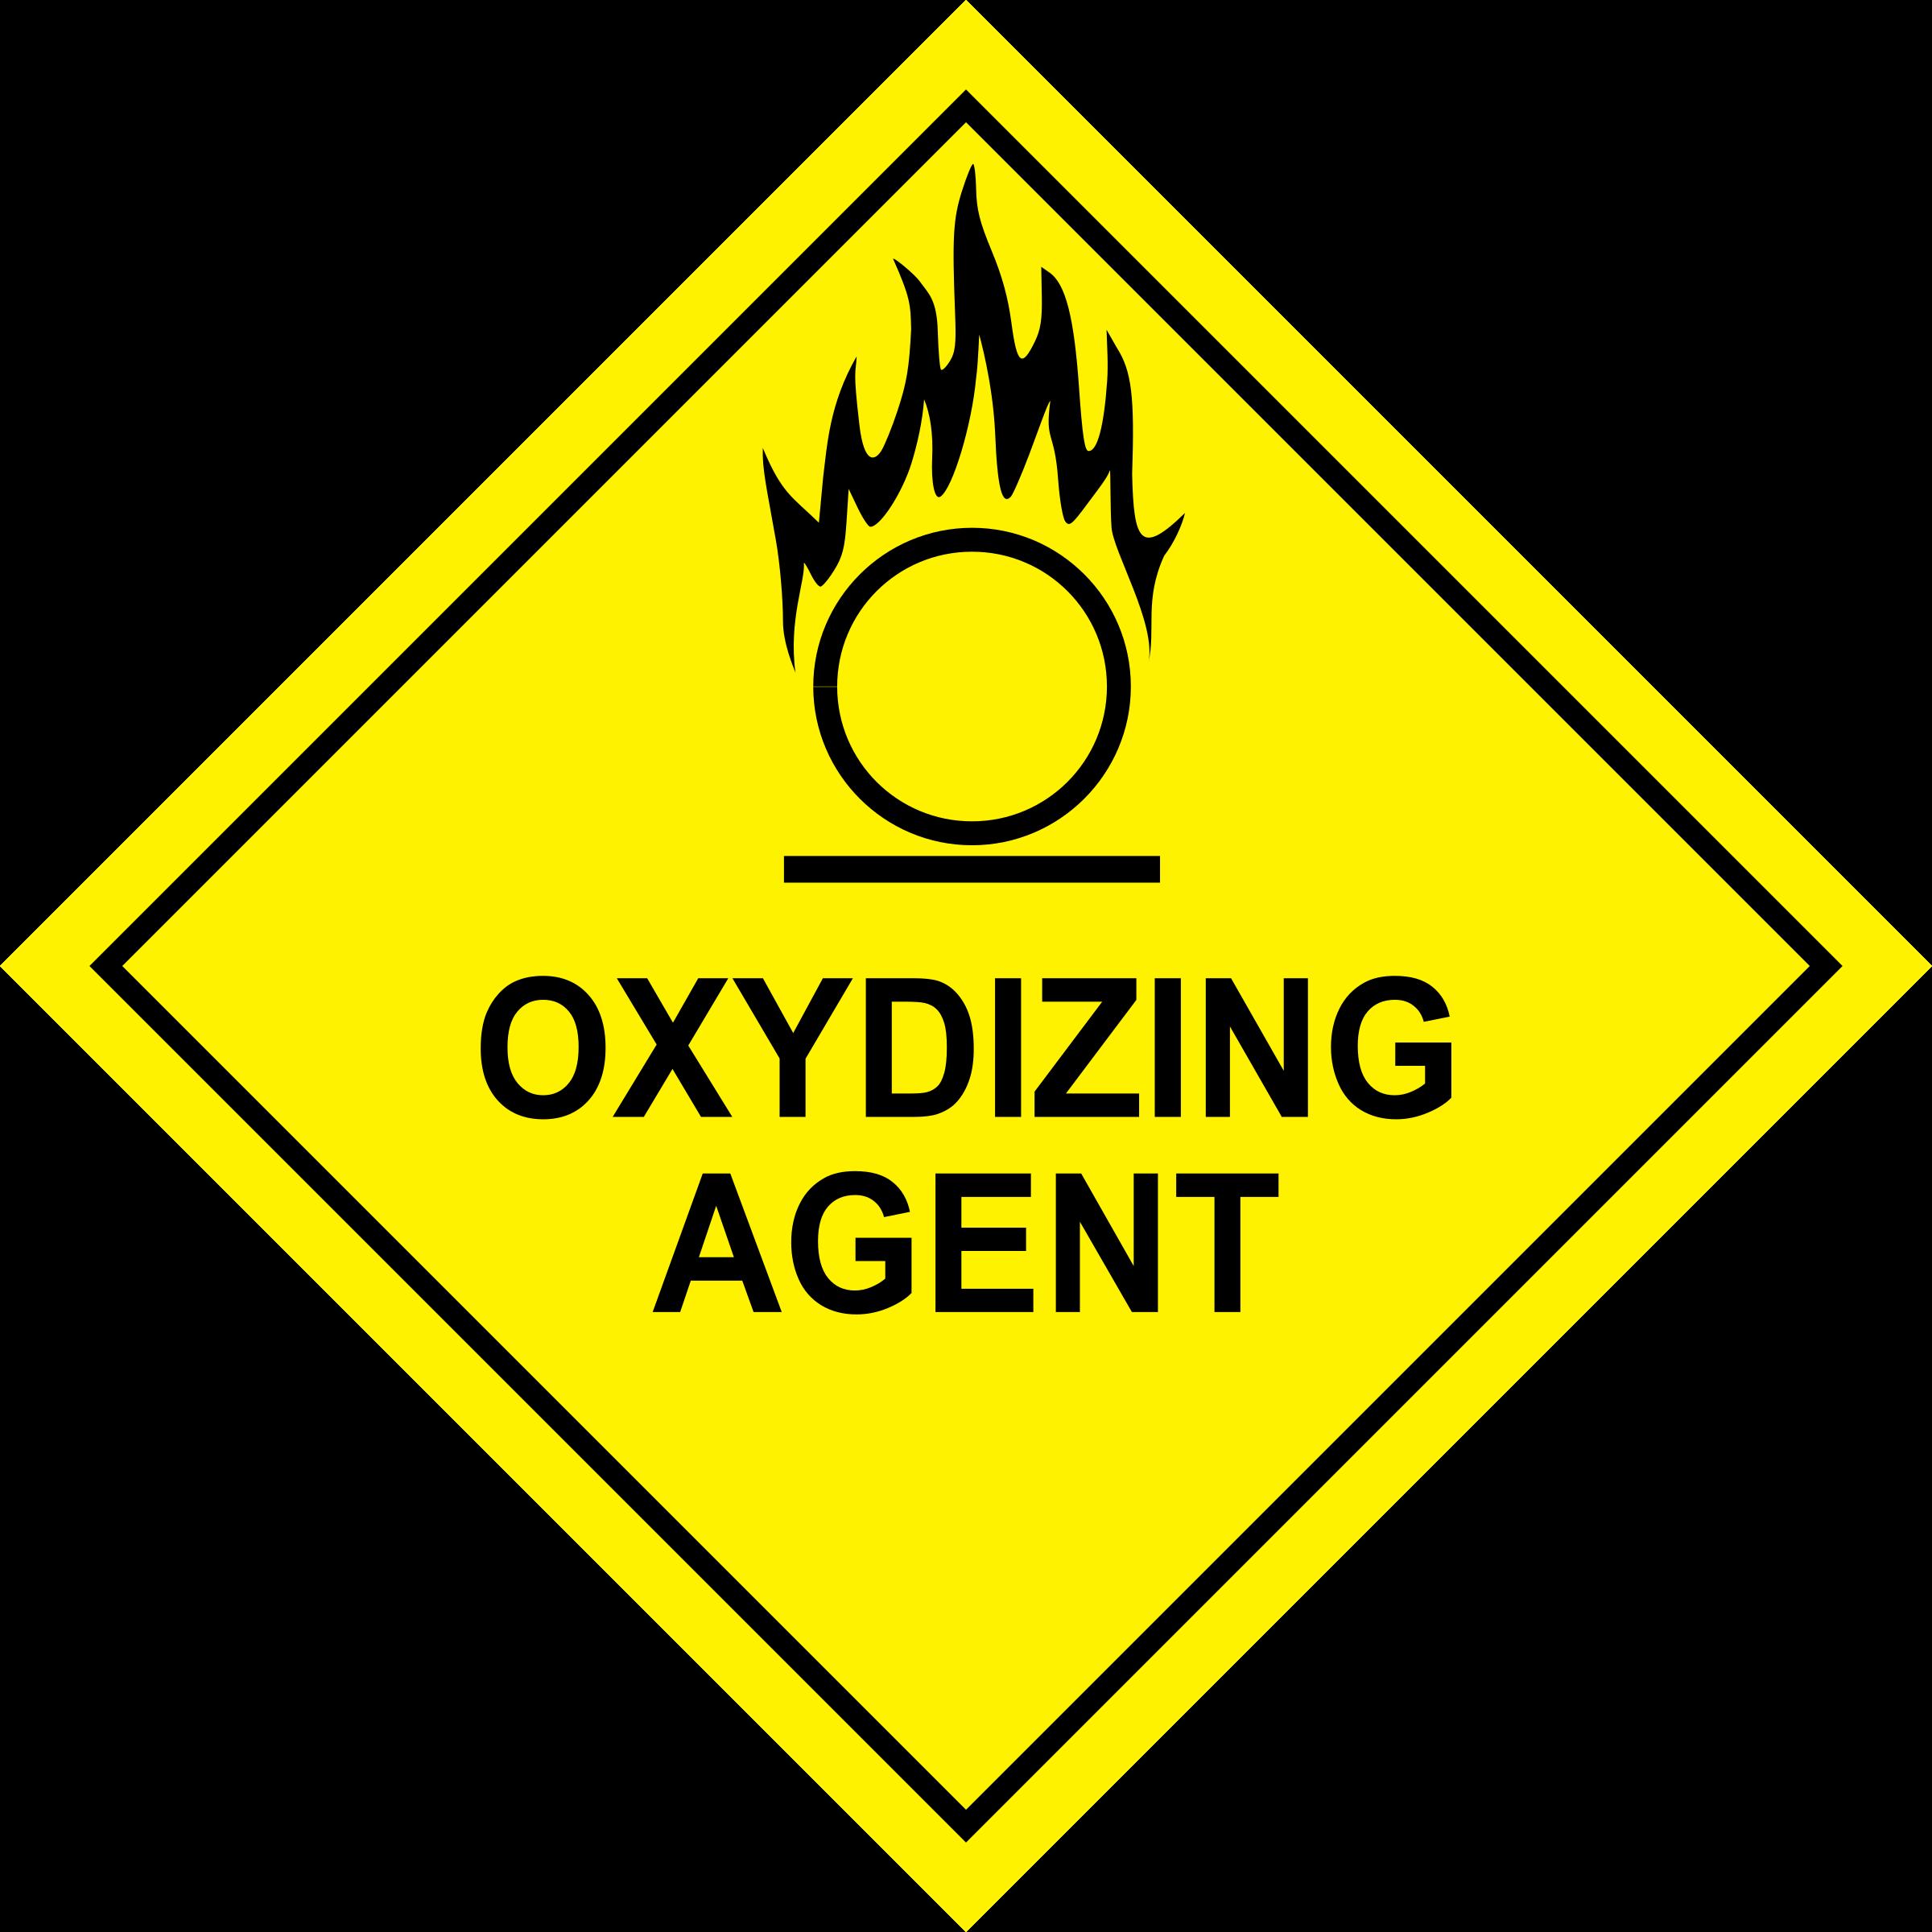 Oxidized clipart #2